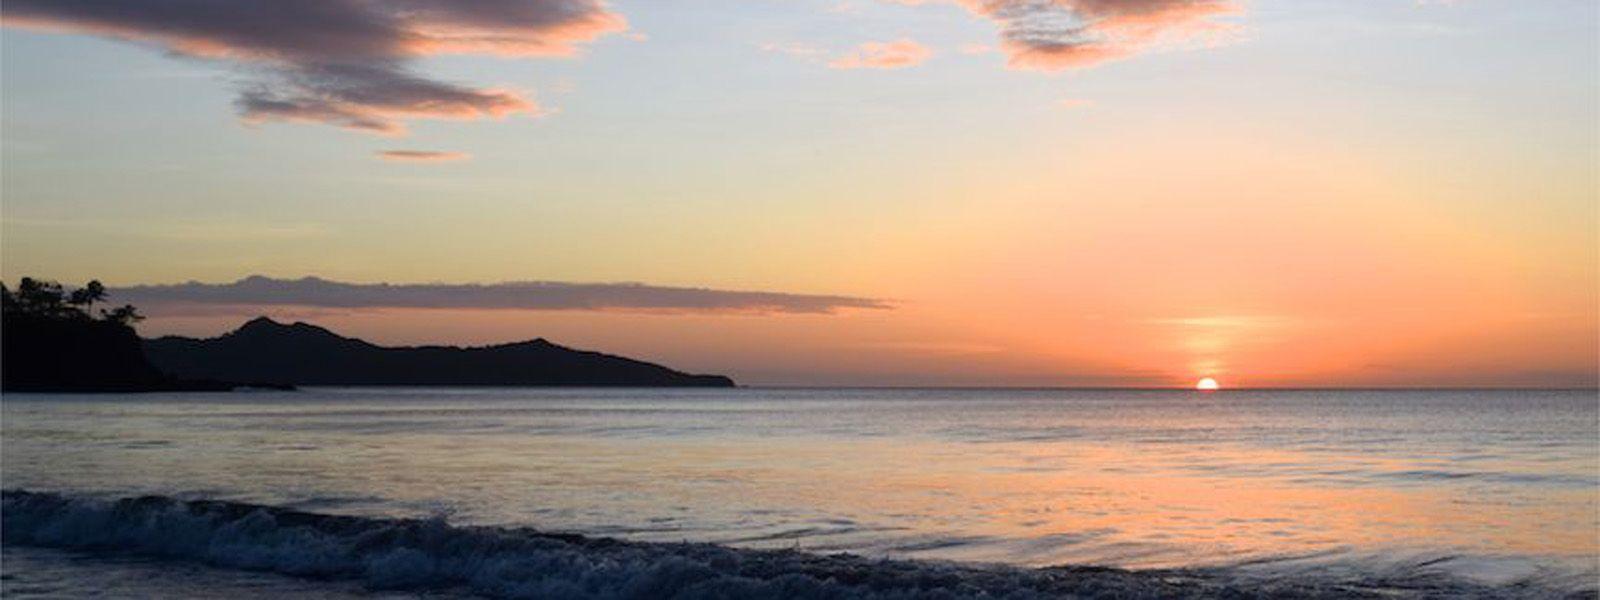 Flamingo Beach, Costa Rica16